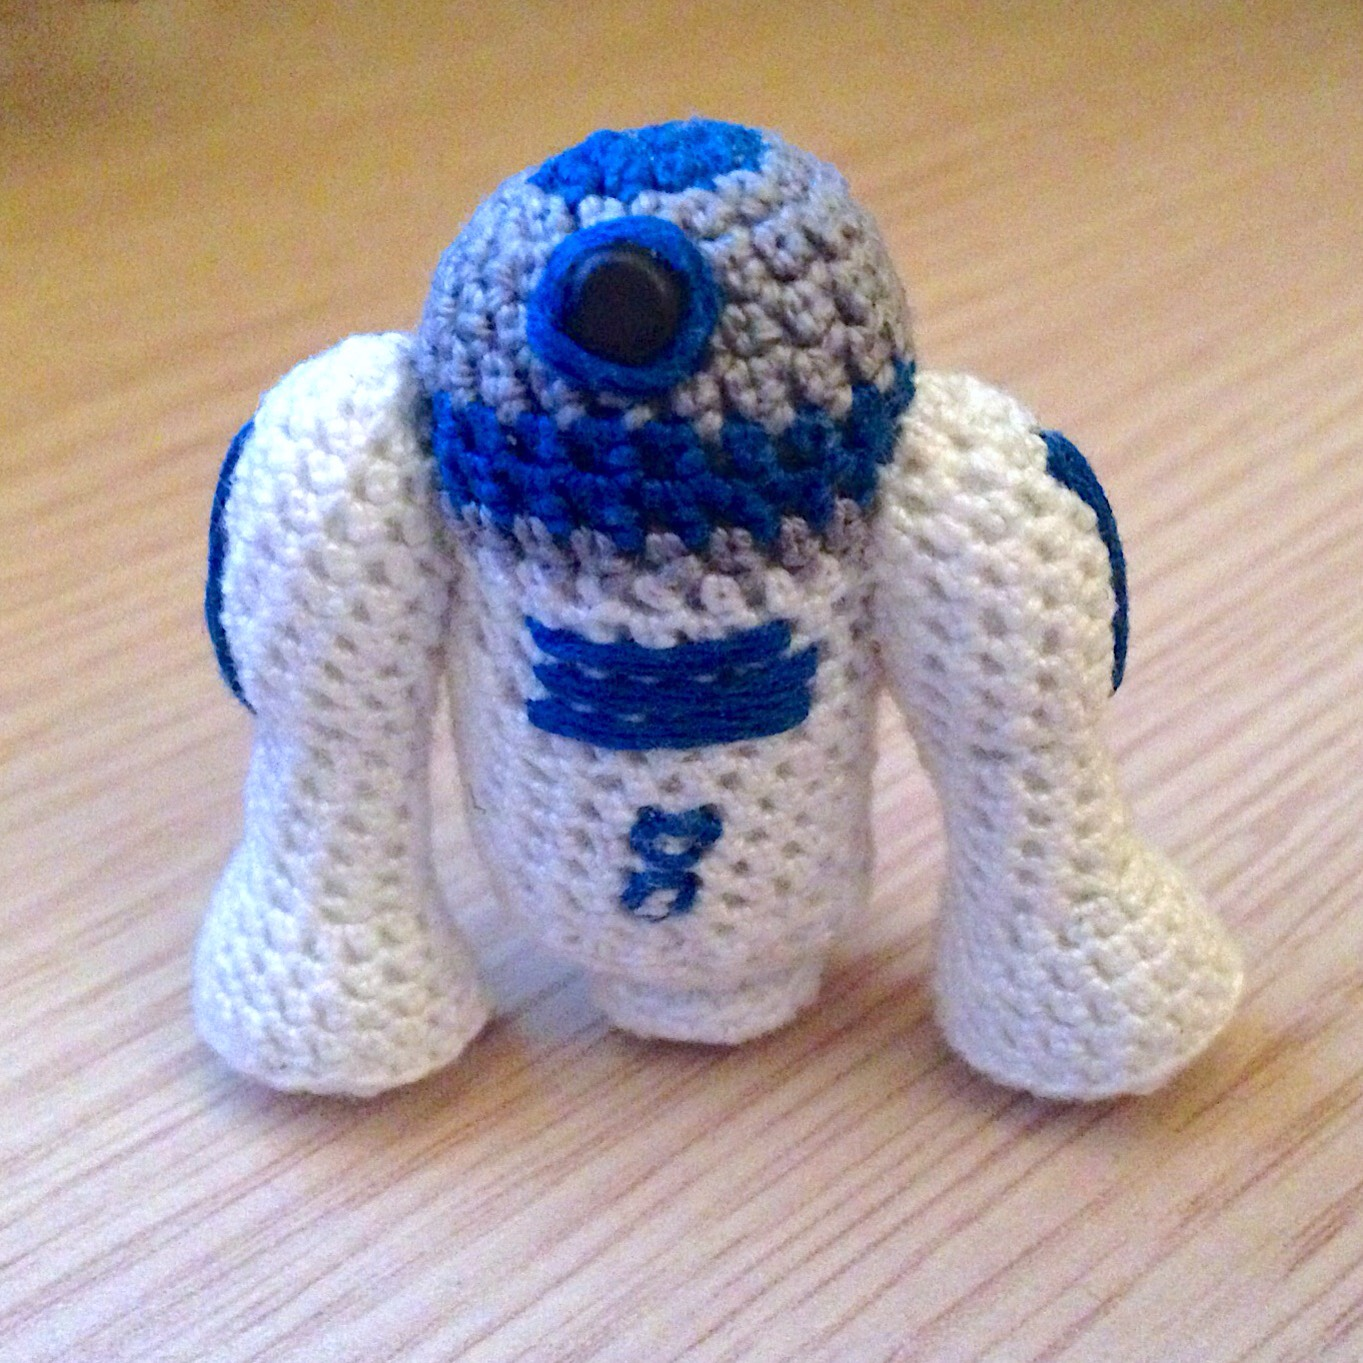 Schemi Amigurumi Star Wars : La piccola bottega della Creativit?: Star Wars: R2-D2 ...